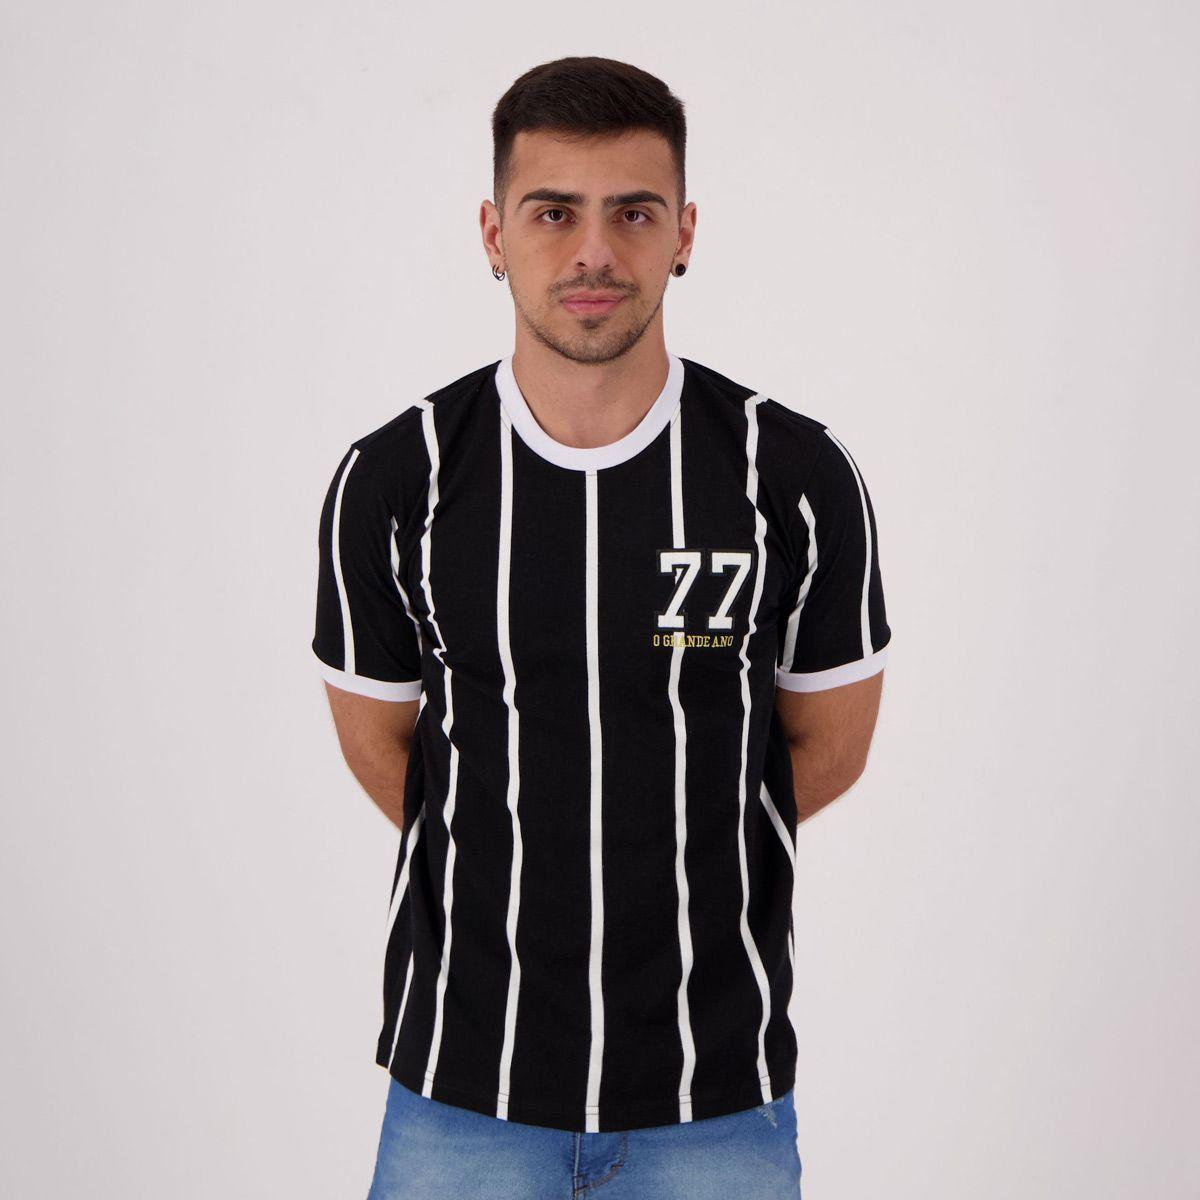 Camisas retrô futebol: Corinthians